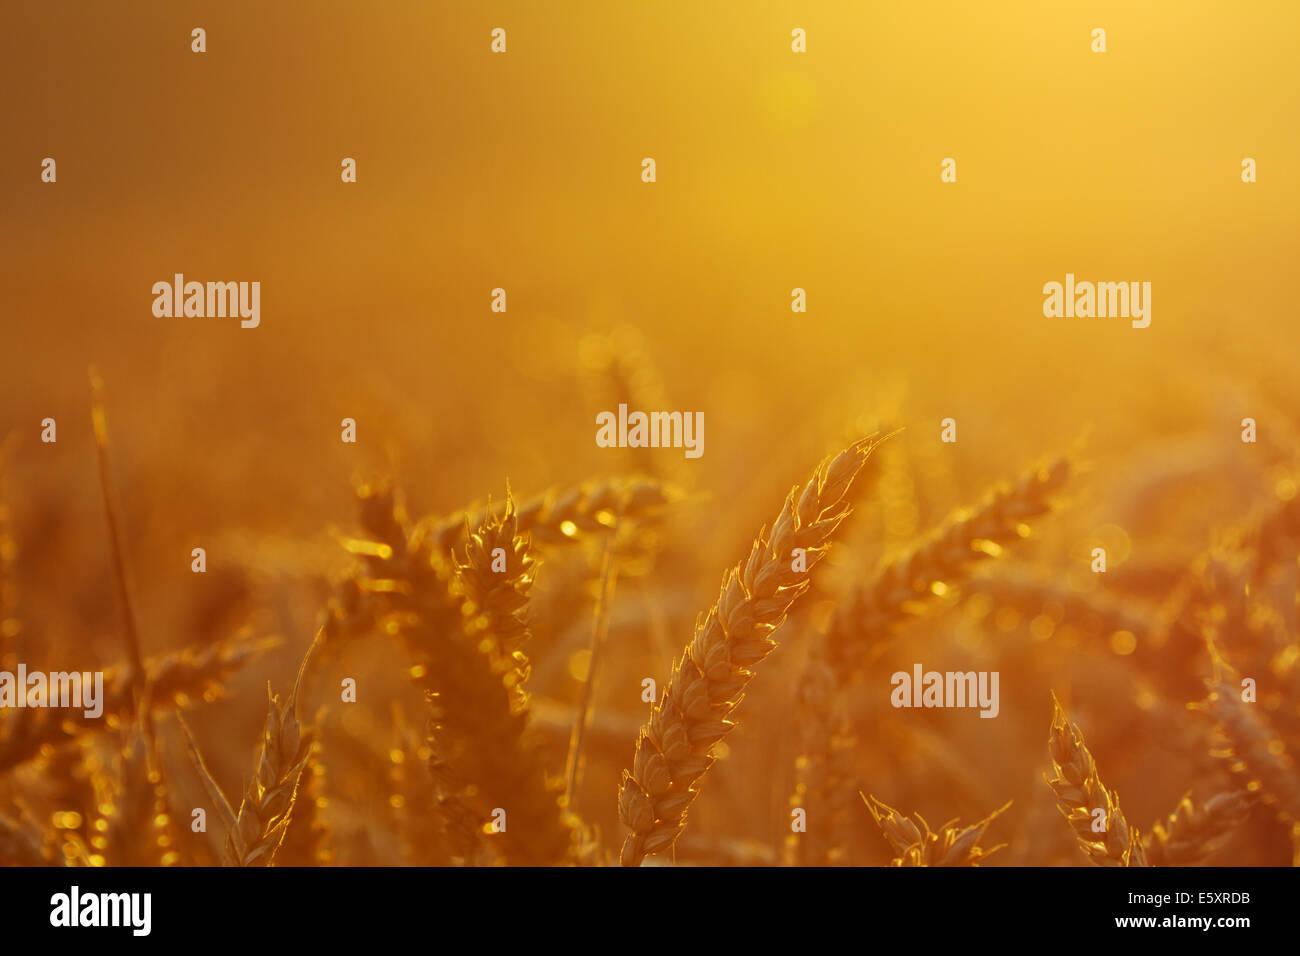 Wheat field by sunset, headlight, close-up - Stock Image